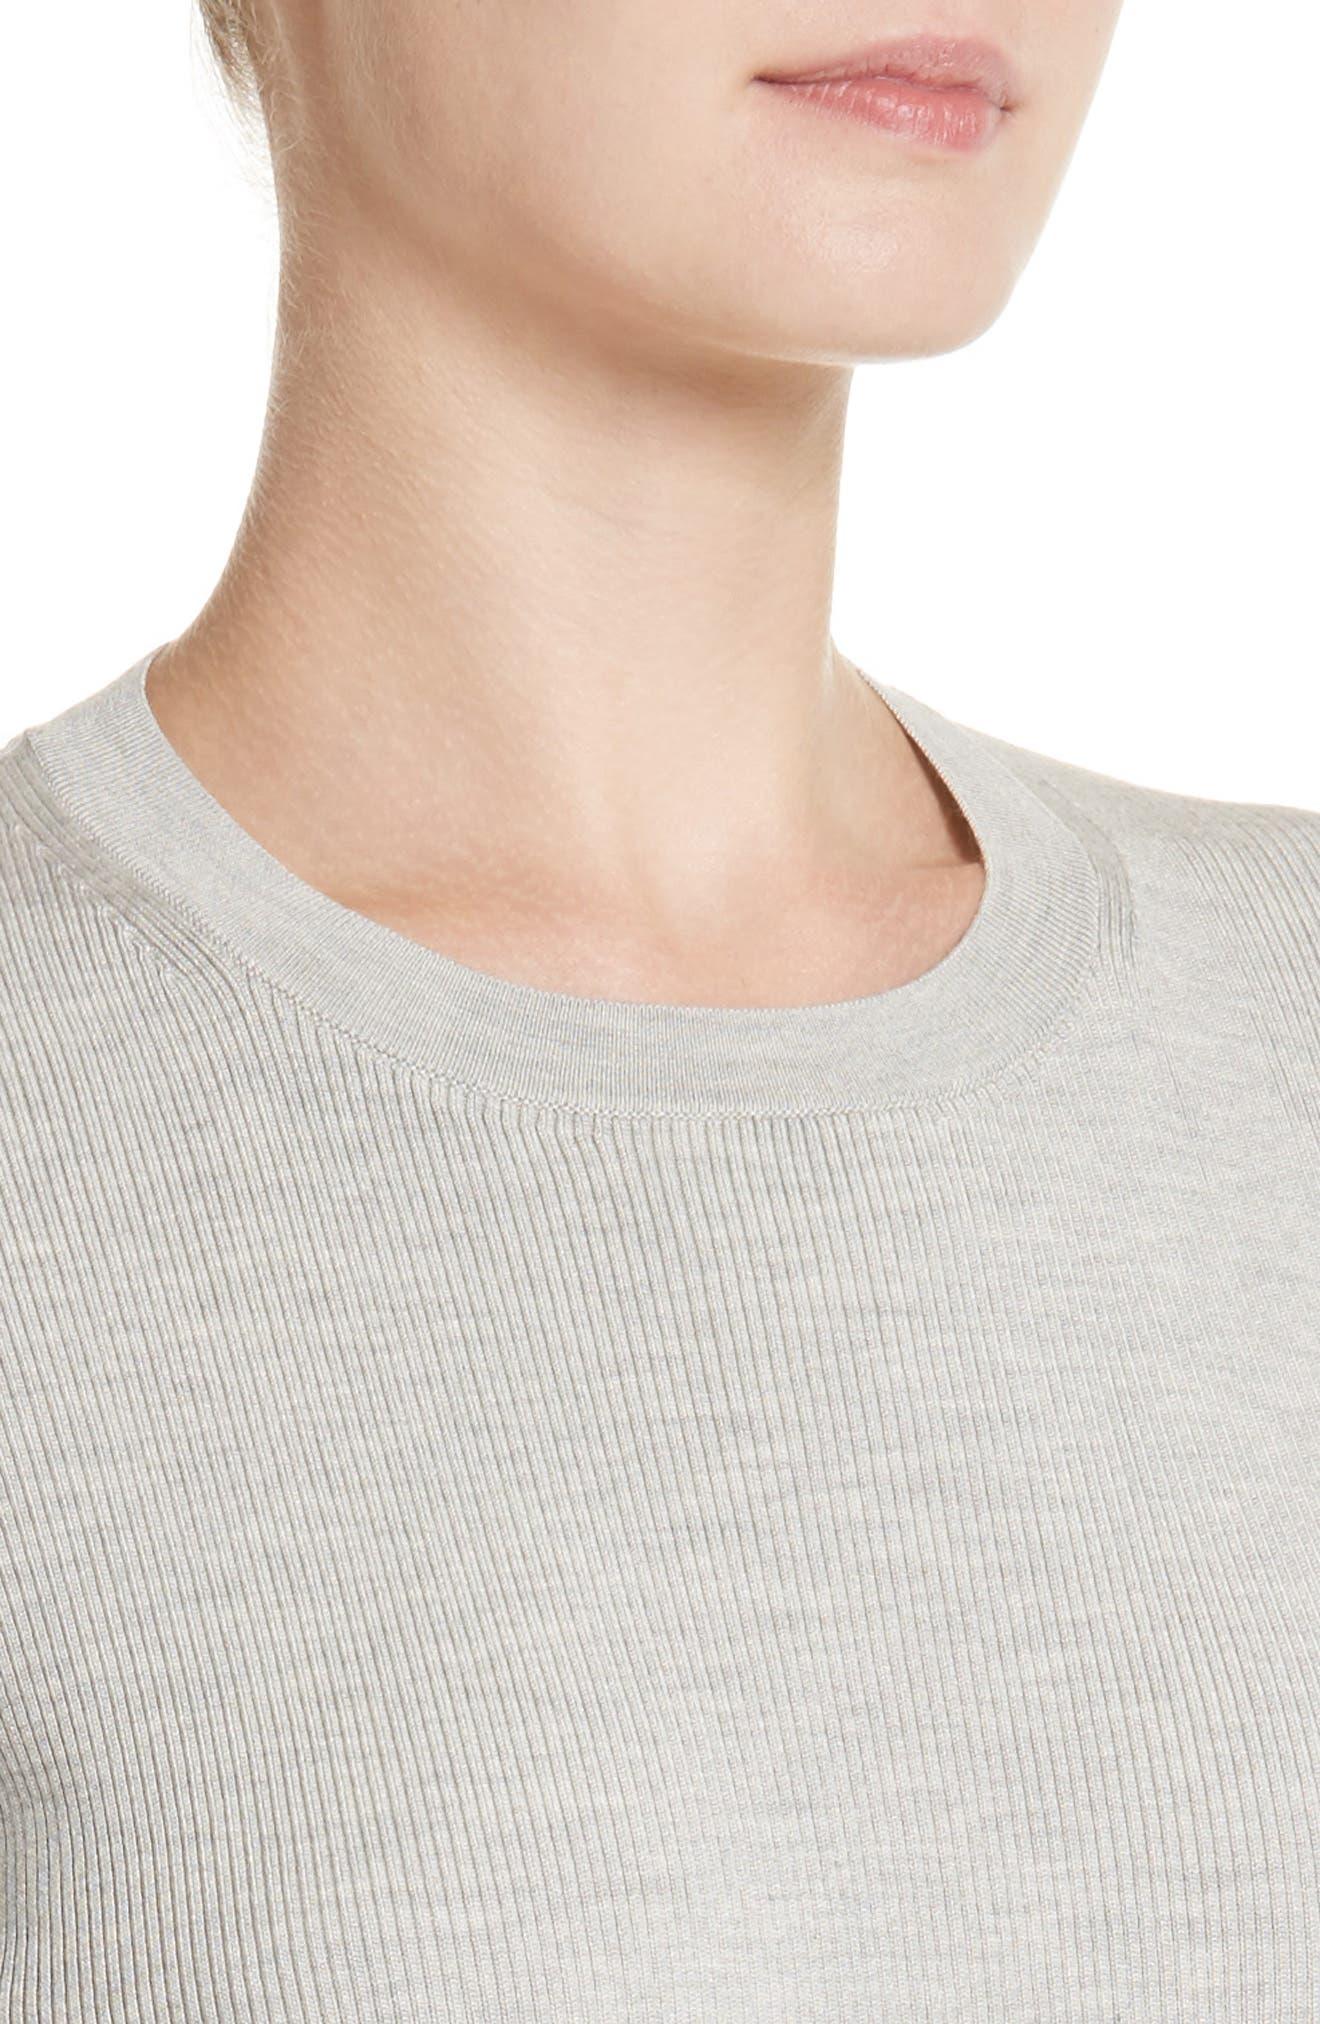 Rib Knit Silk Blend Sweater,                             Alternate thumbnail 4, color,                             Pebble Melange